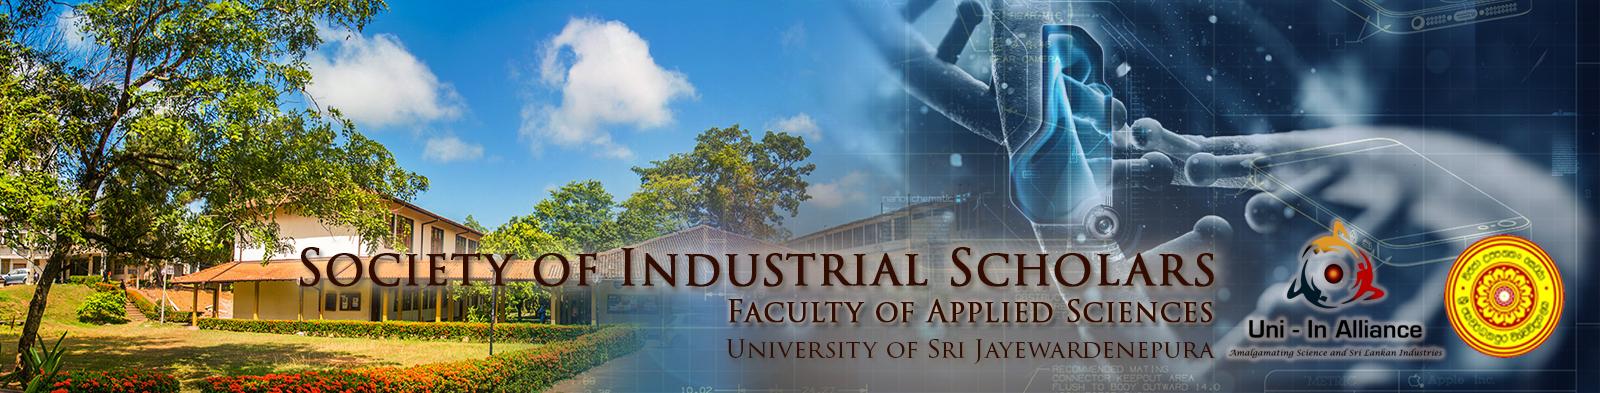 Society of Industrial Scholars